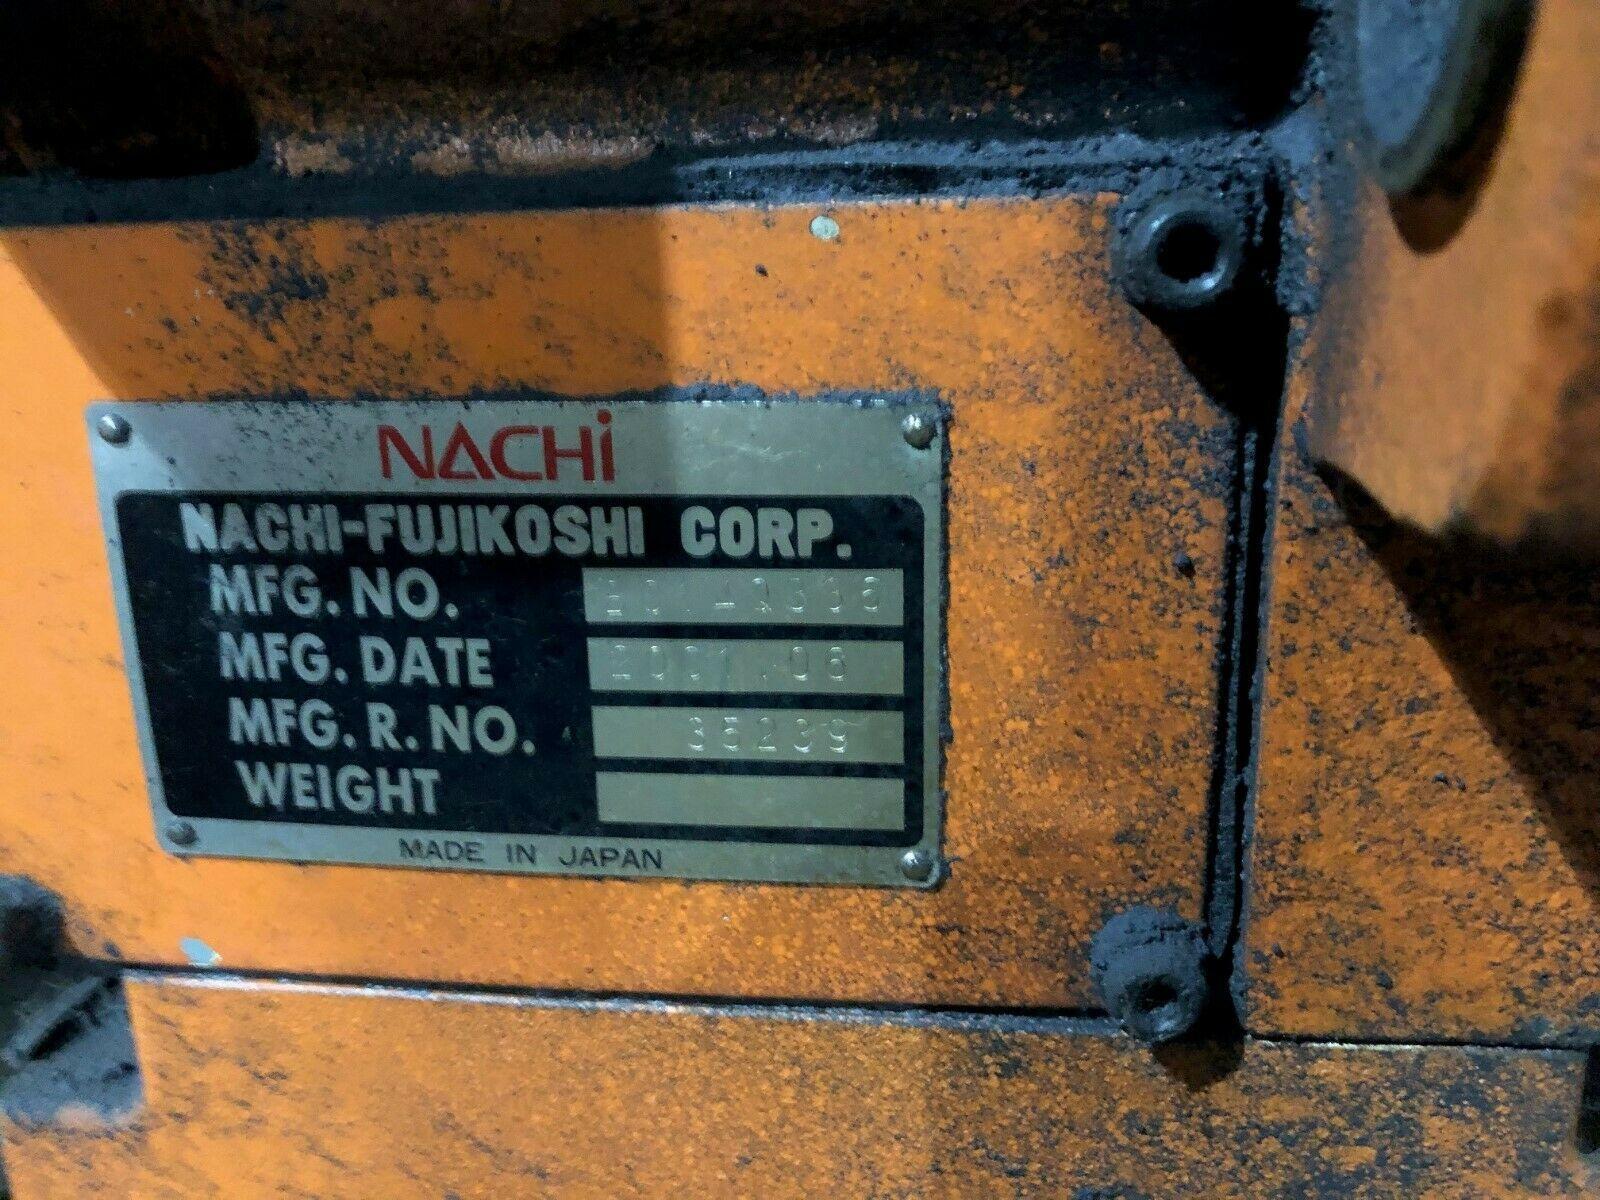 NACHI ROBOT WELDING ARMS